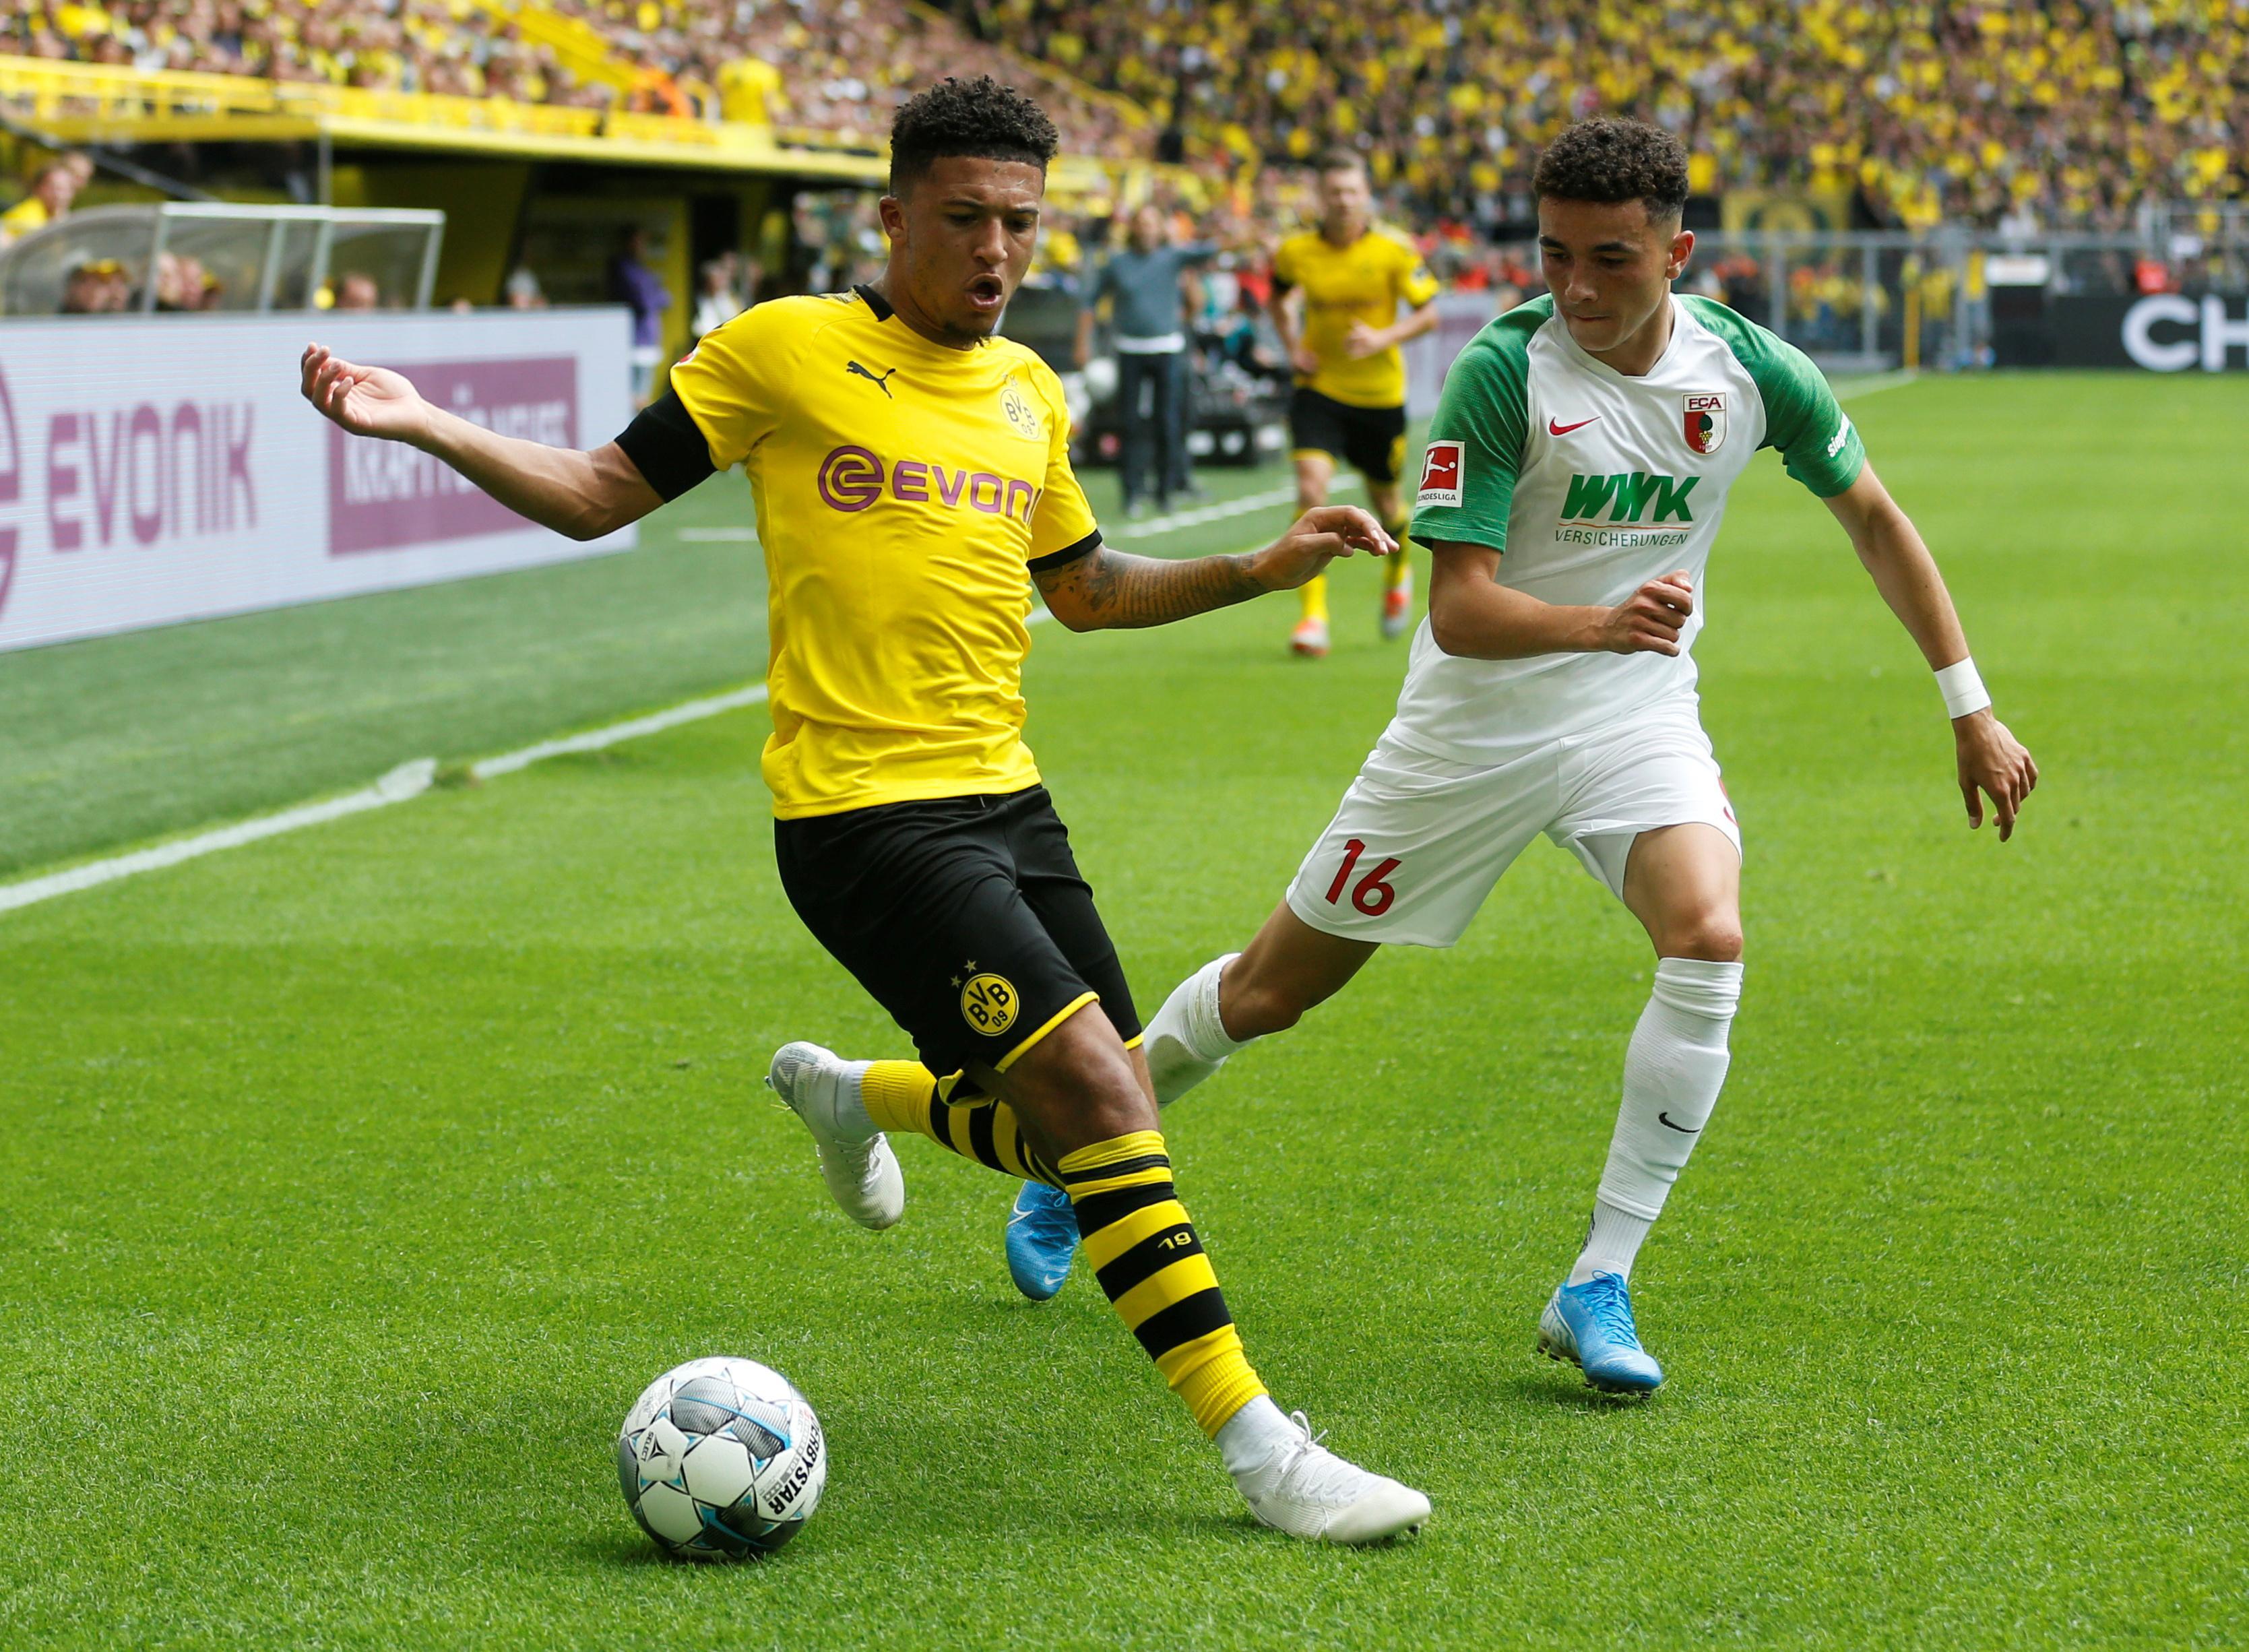 Dortmund crush Augsburg to set title marker in season opener